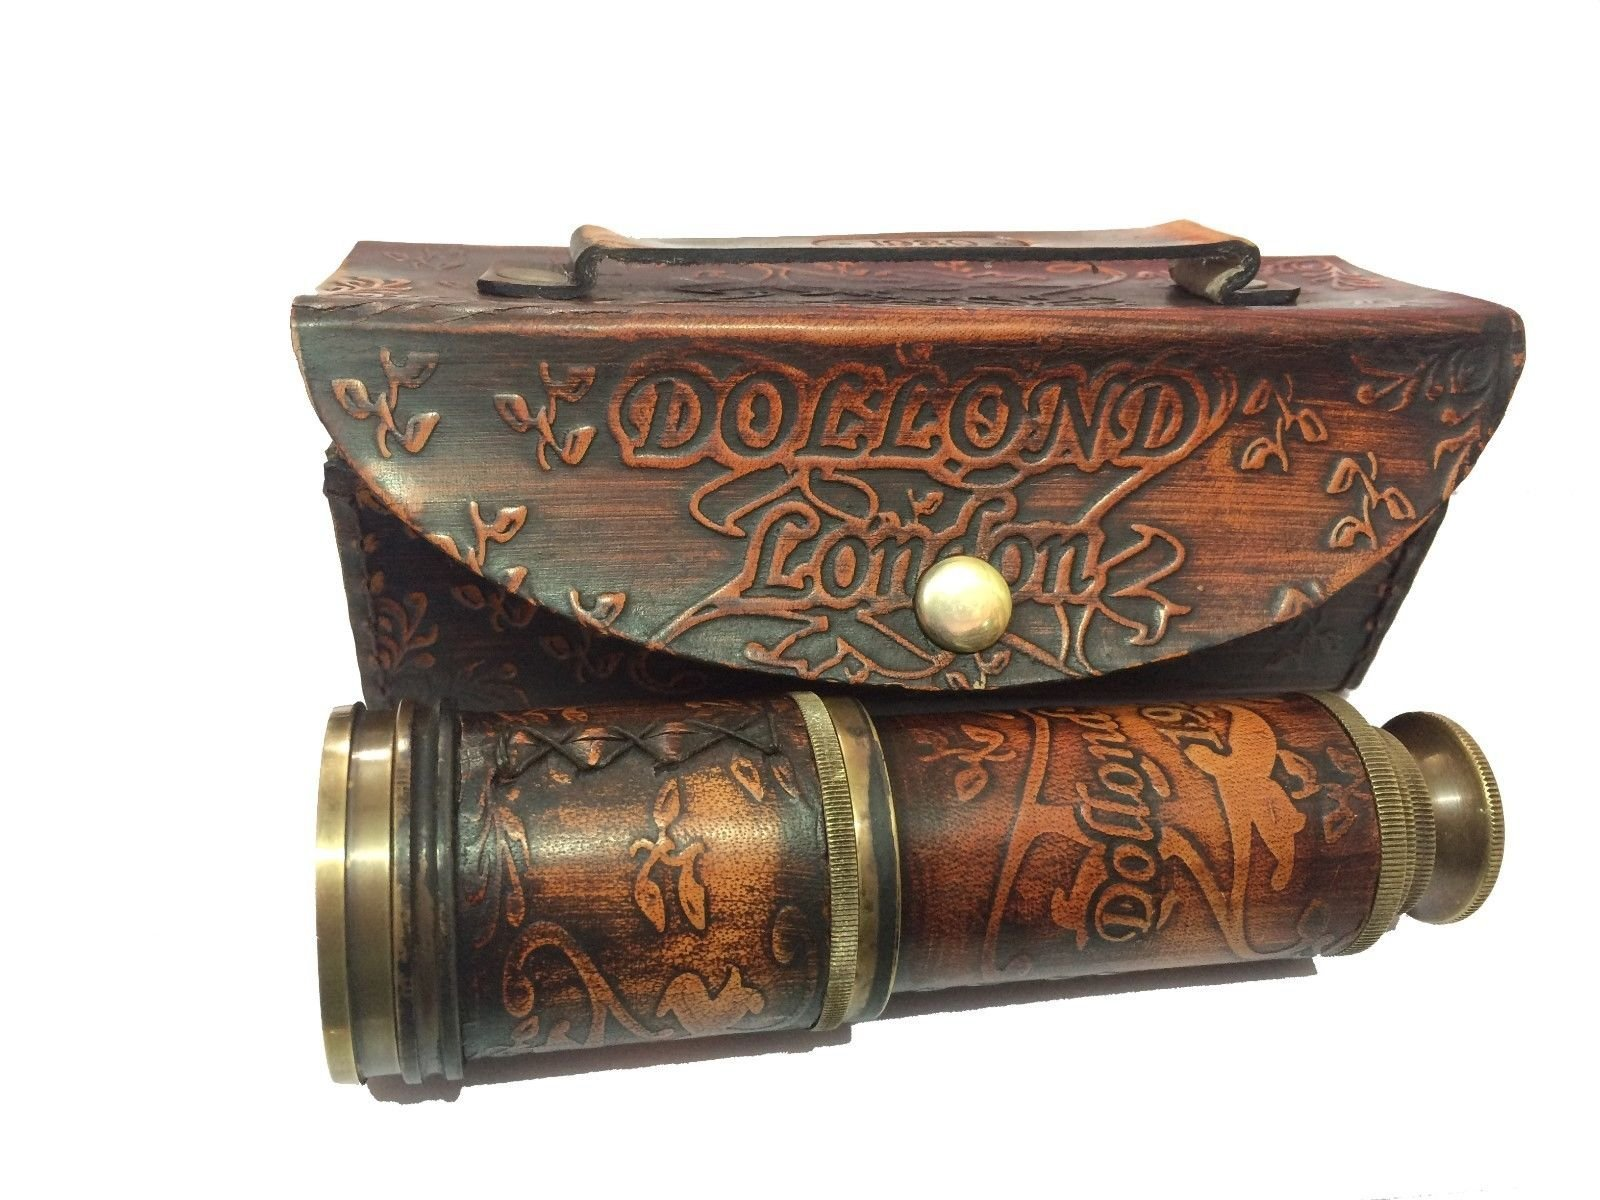 Marine Nautical Store Vintage Antique Maritime Brass Leather Telescope Pirate Spyglass Scope w/Cover